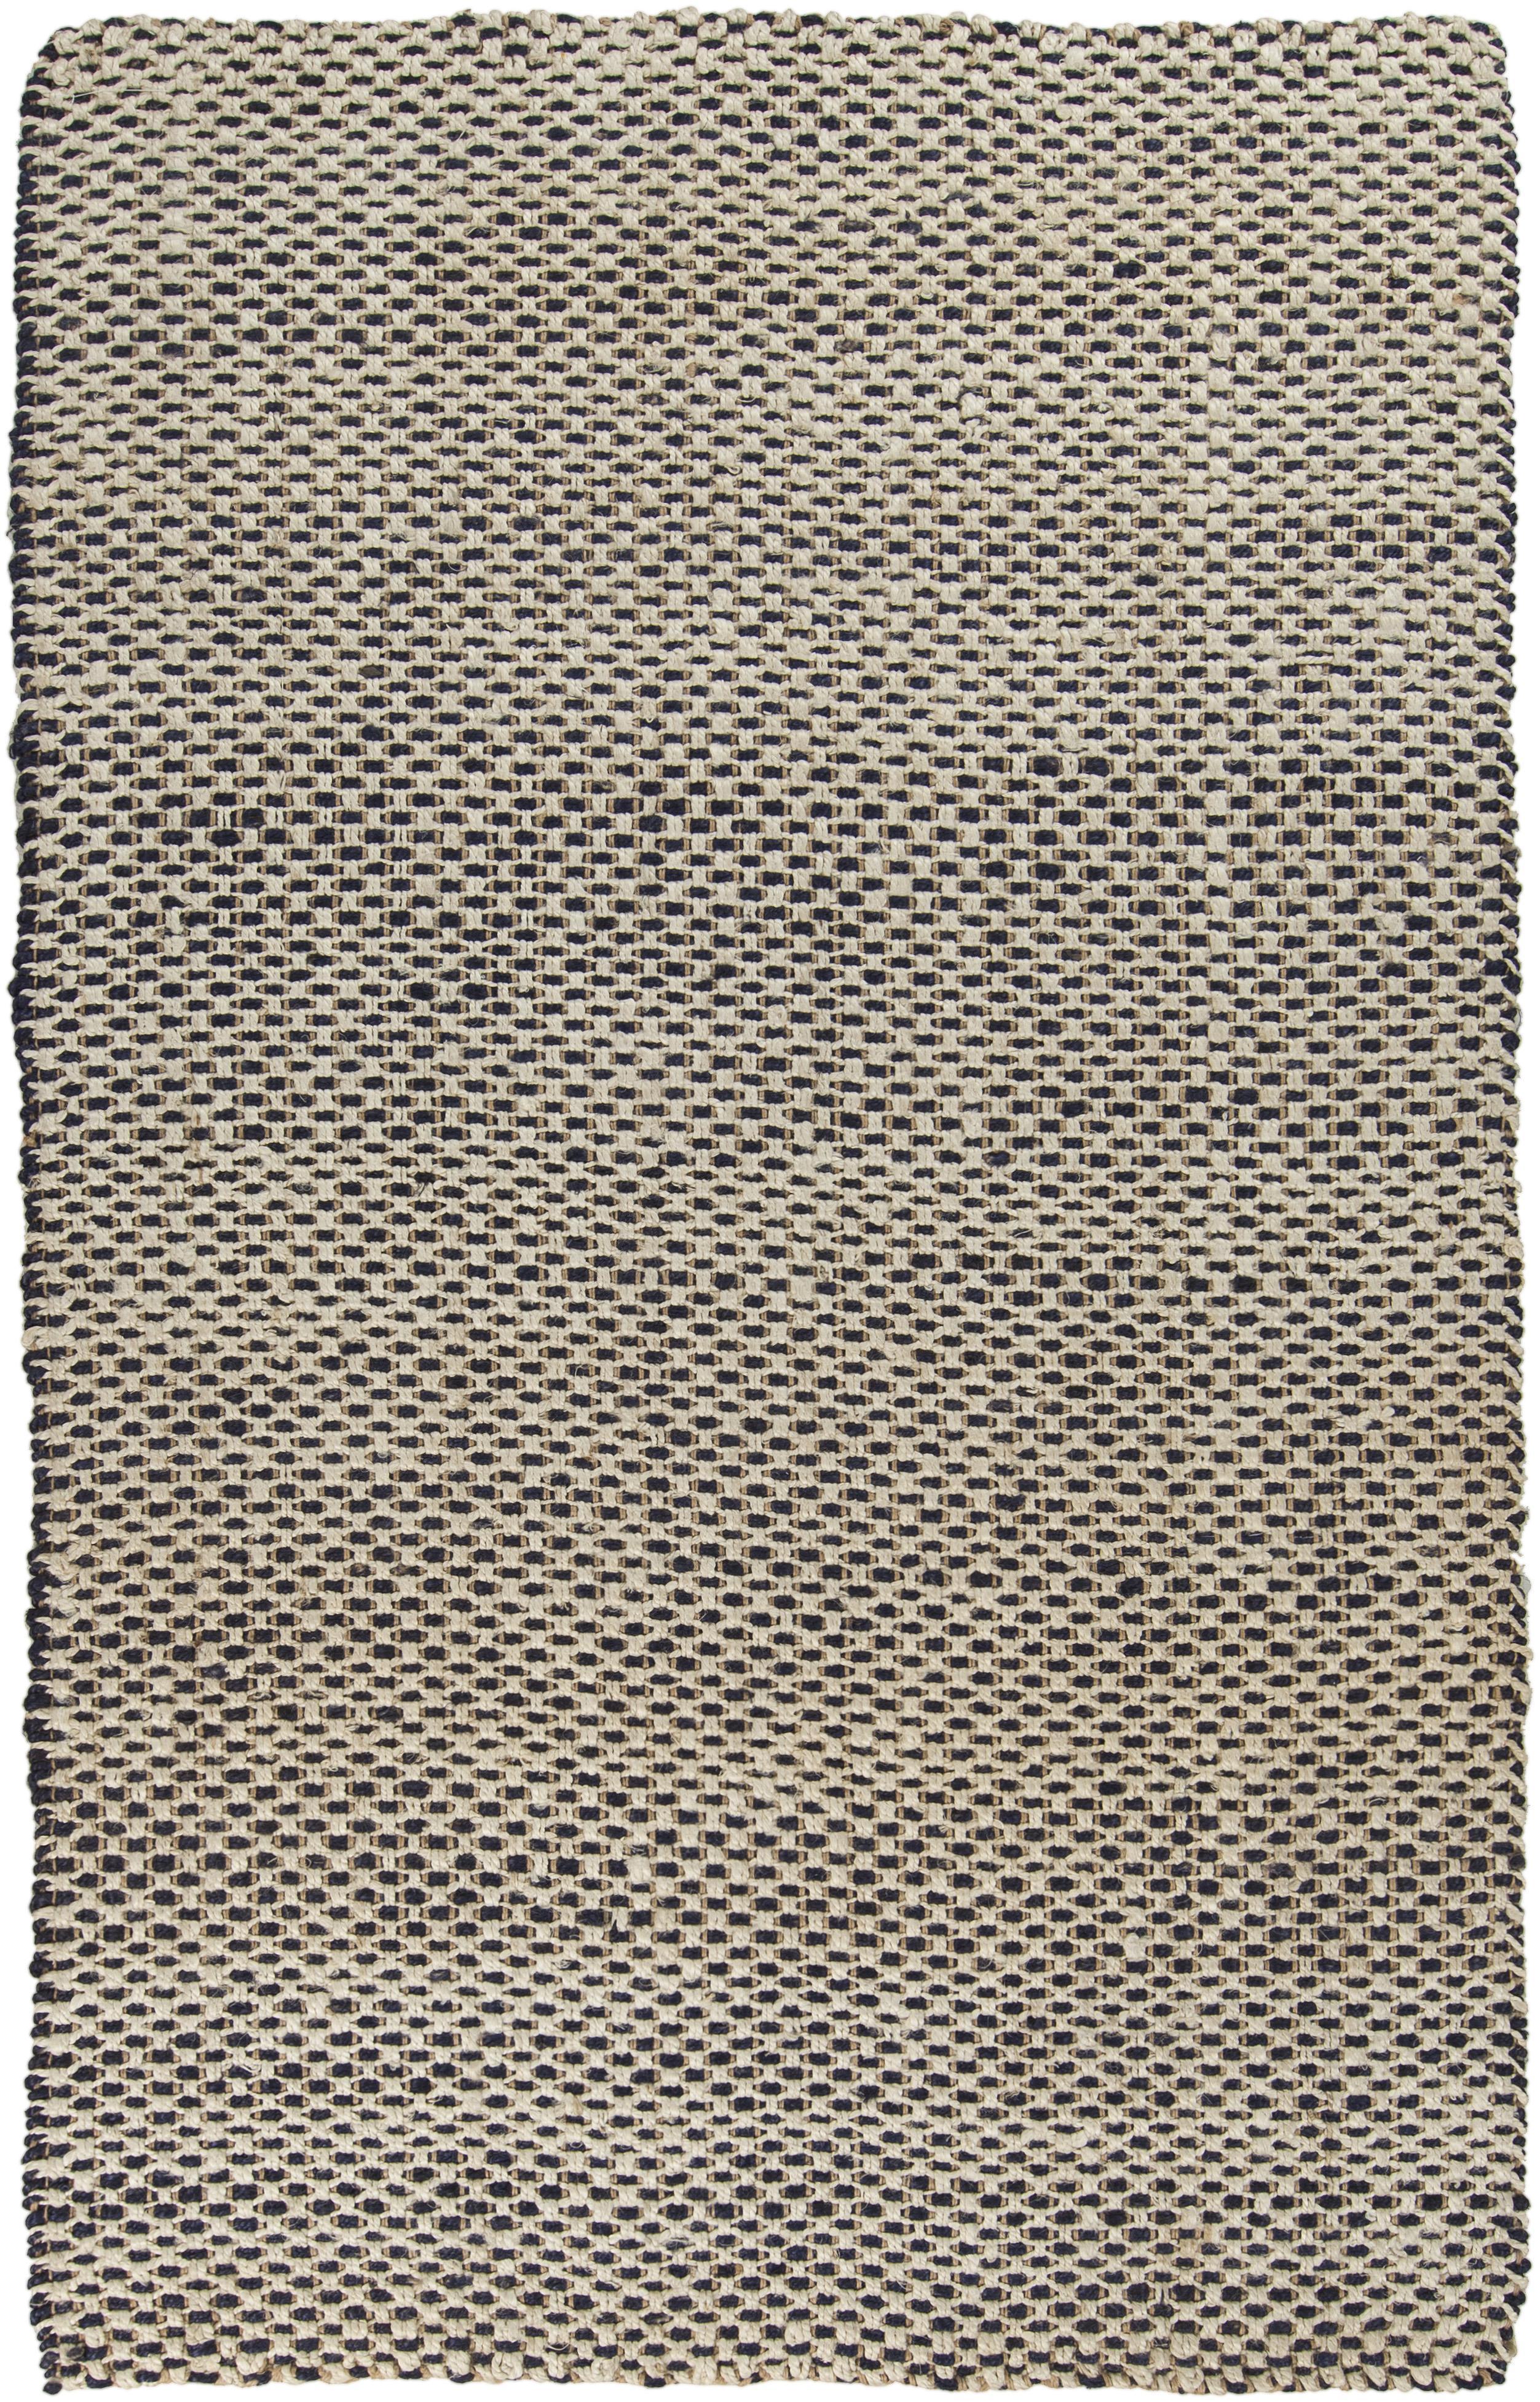 Surya Reeds 5' x 8' - Item Number: REED825-58